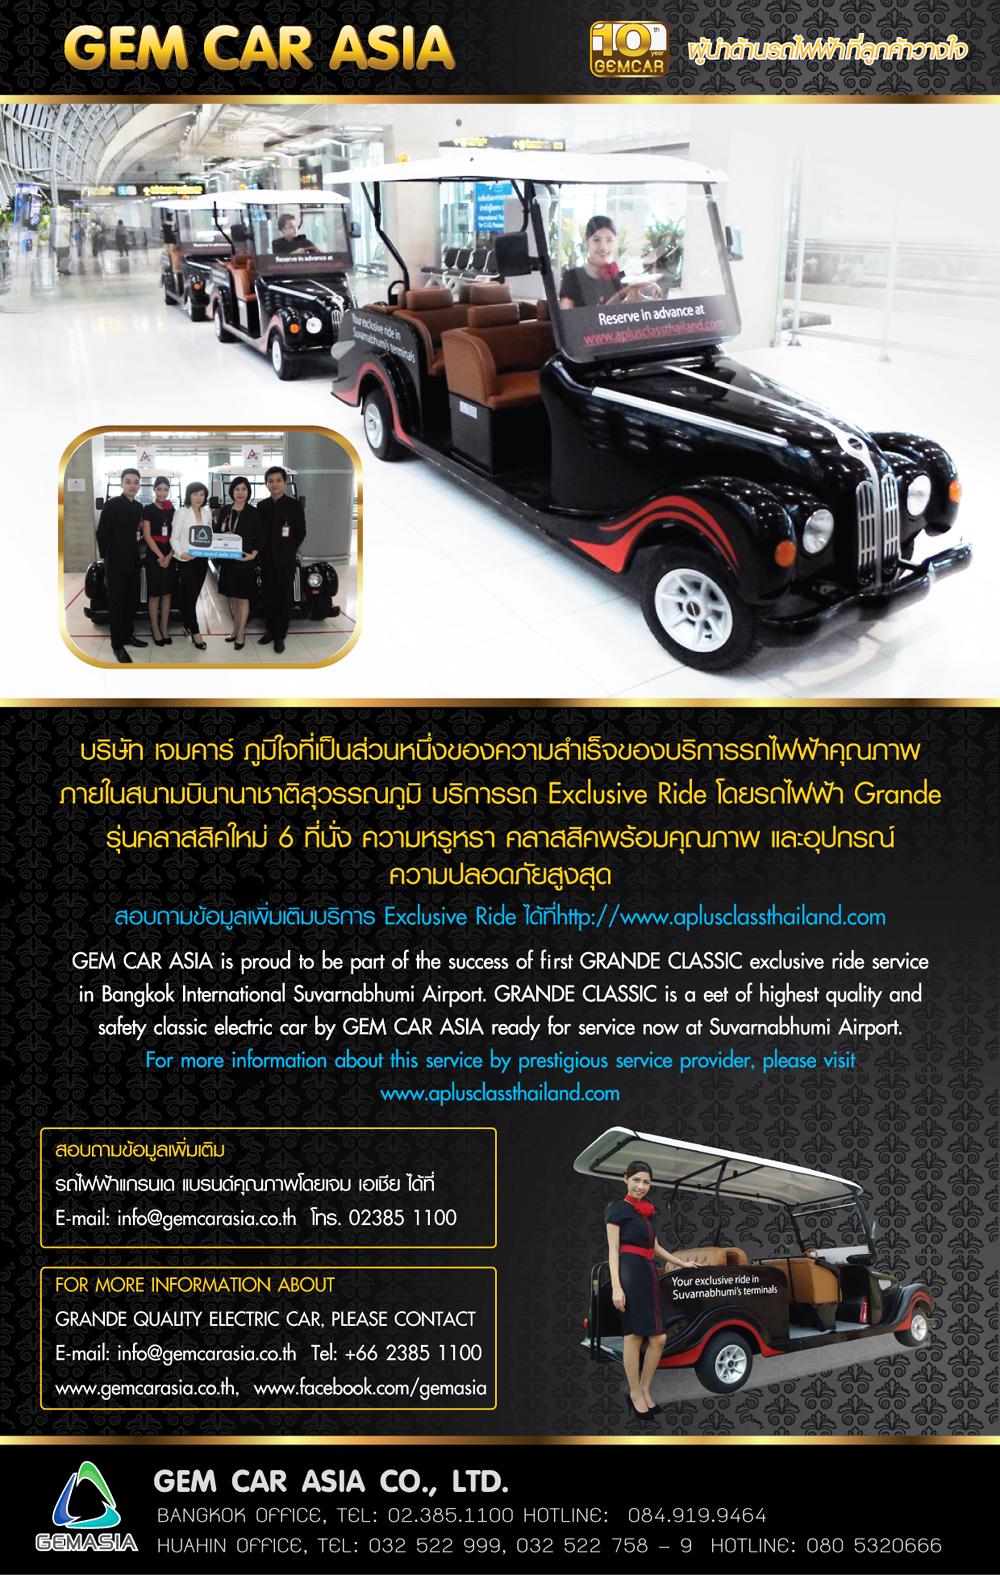 Grande Classic Car For Exclusive Ride At Bangkok International Antique Wiring Terminals Suvarnabhumi Airport Gem Asia Co Ltd